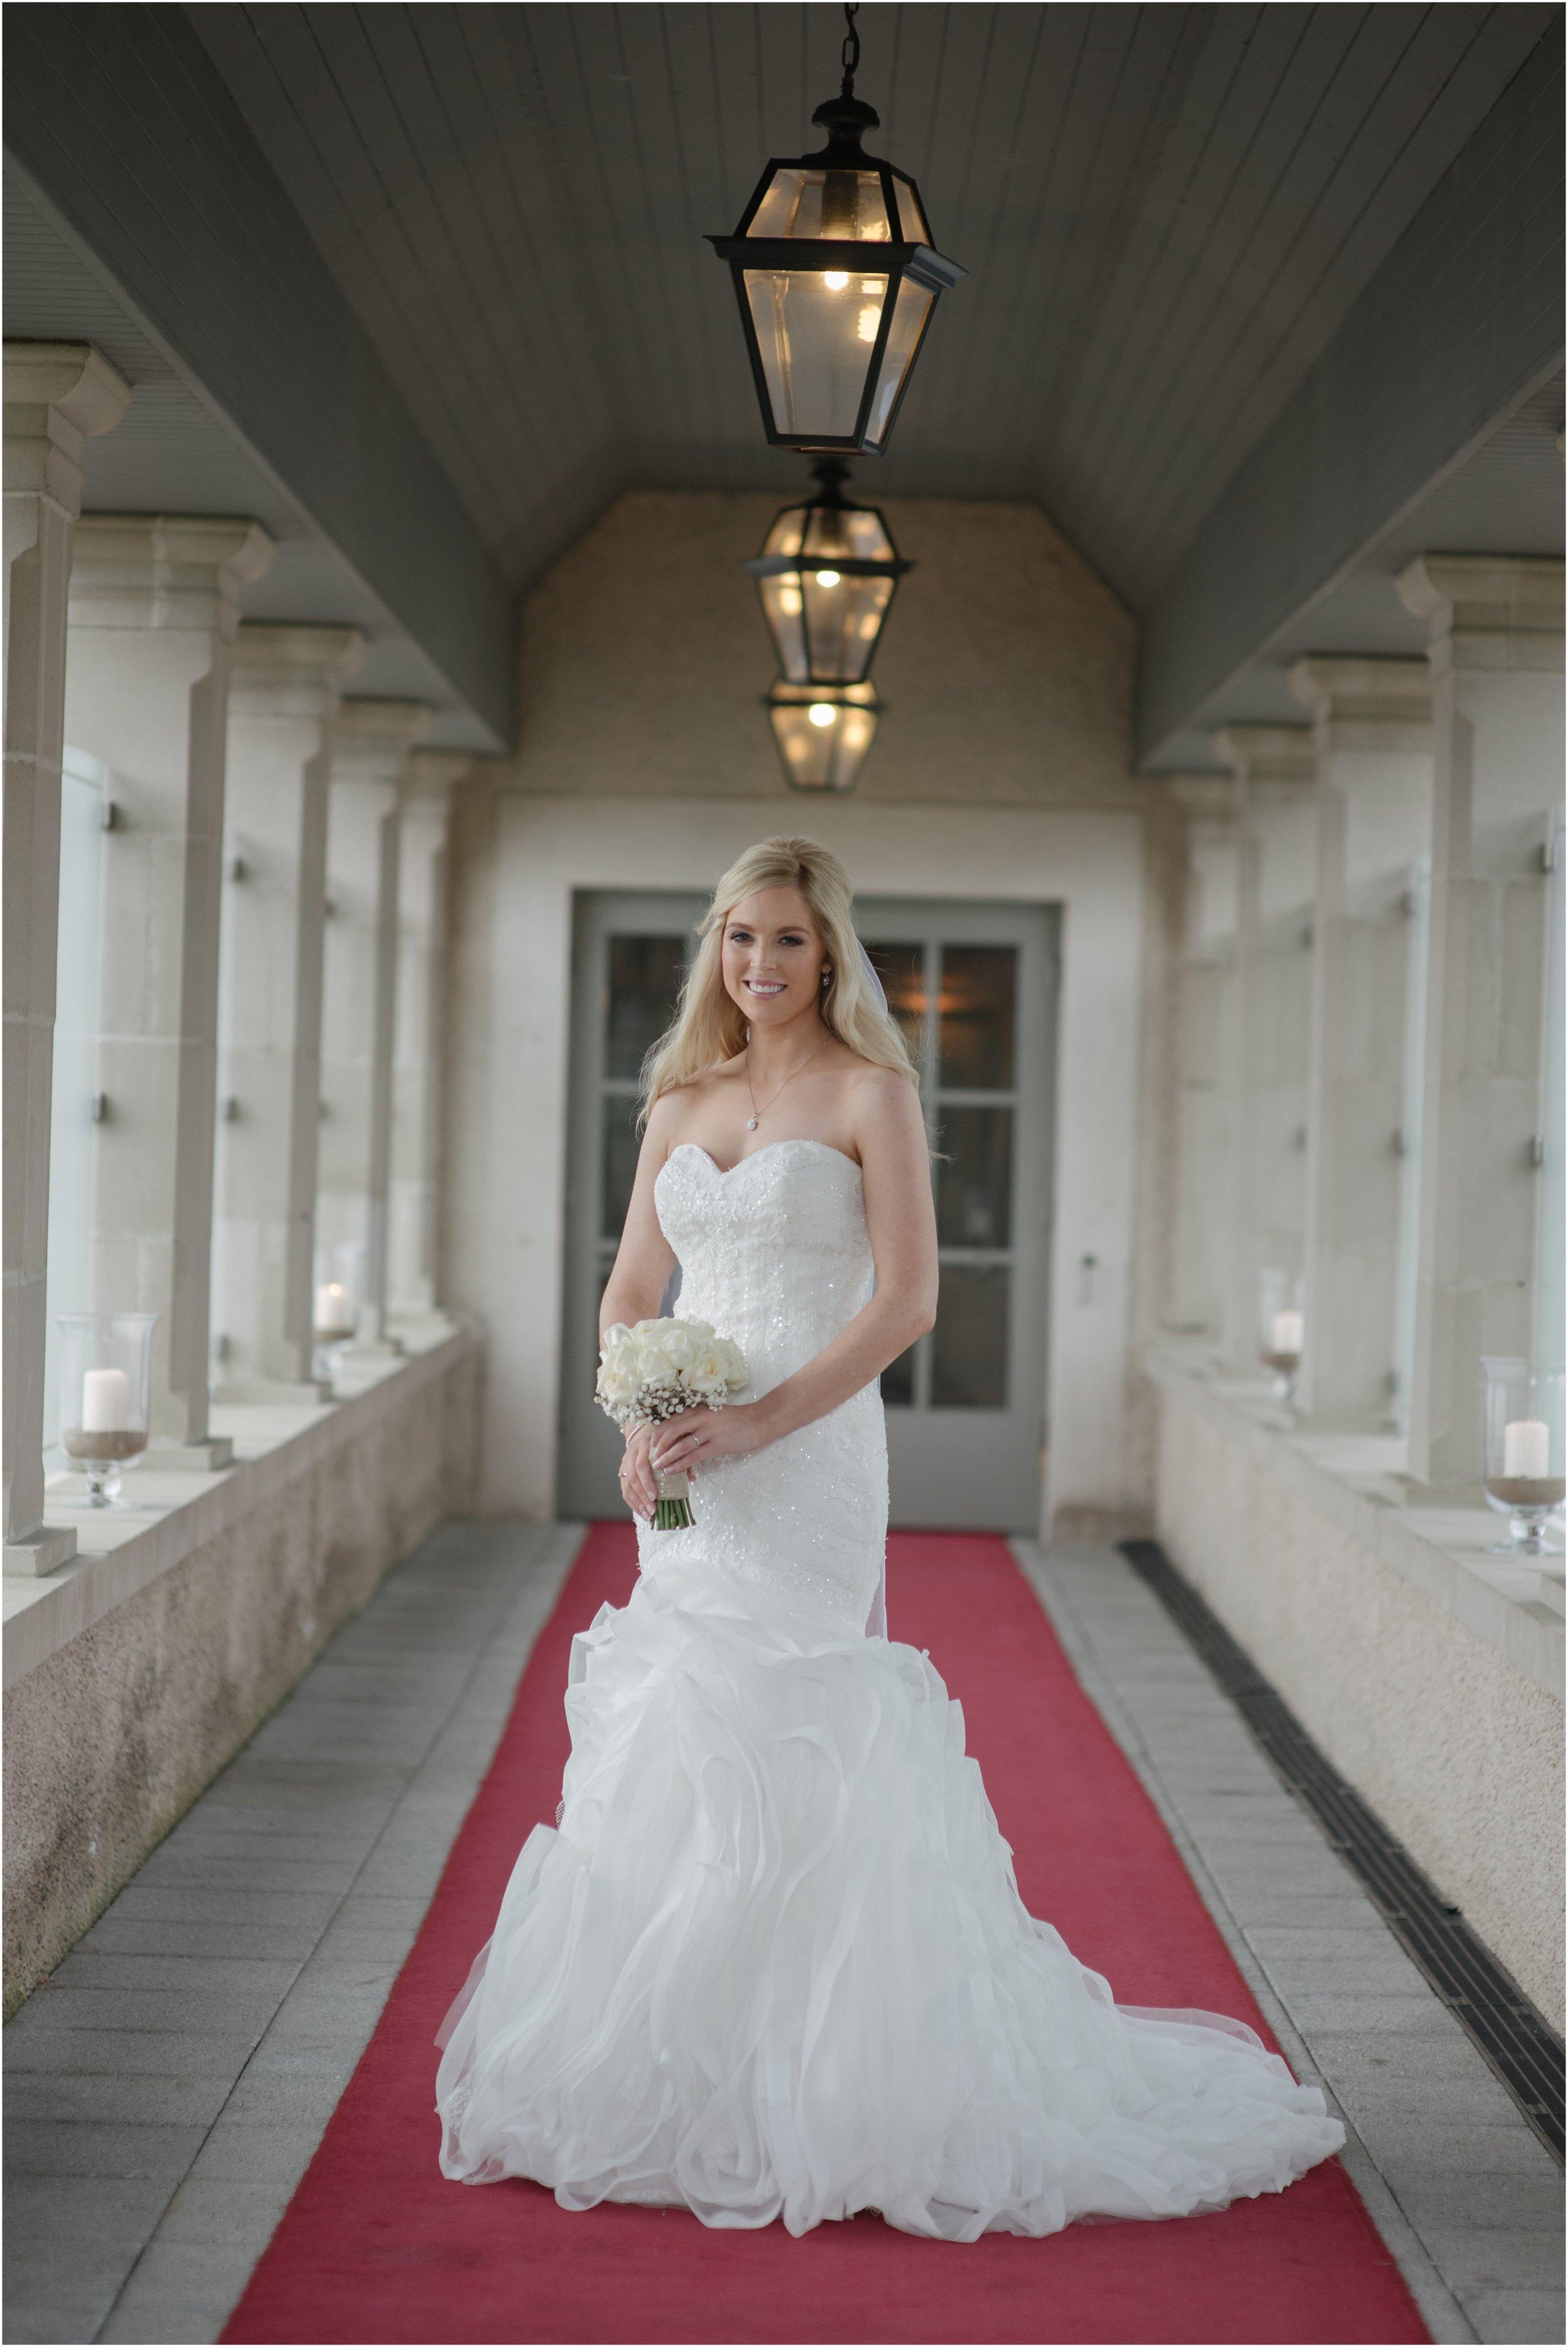 laura-lee-stephen-lough-erne-resort-wedding-photography-co-fermanagh_0044.jpg